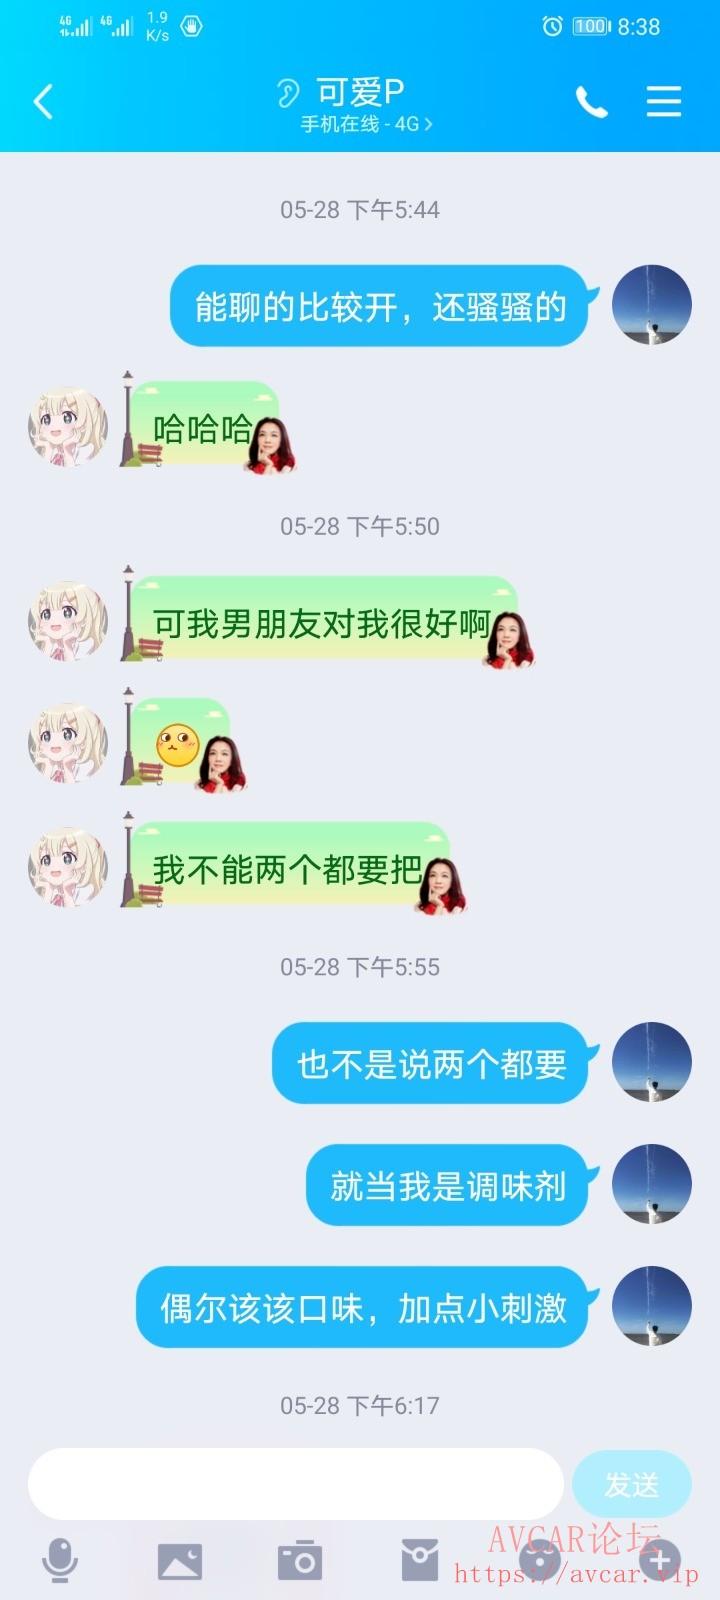 Screenshot_20211011_203859_com.tencent.mobileqq.jpg